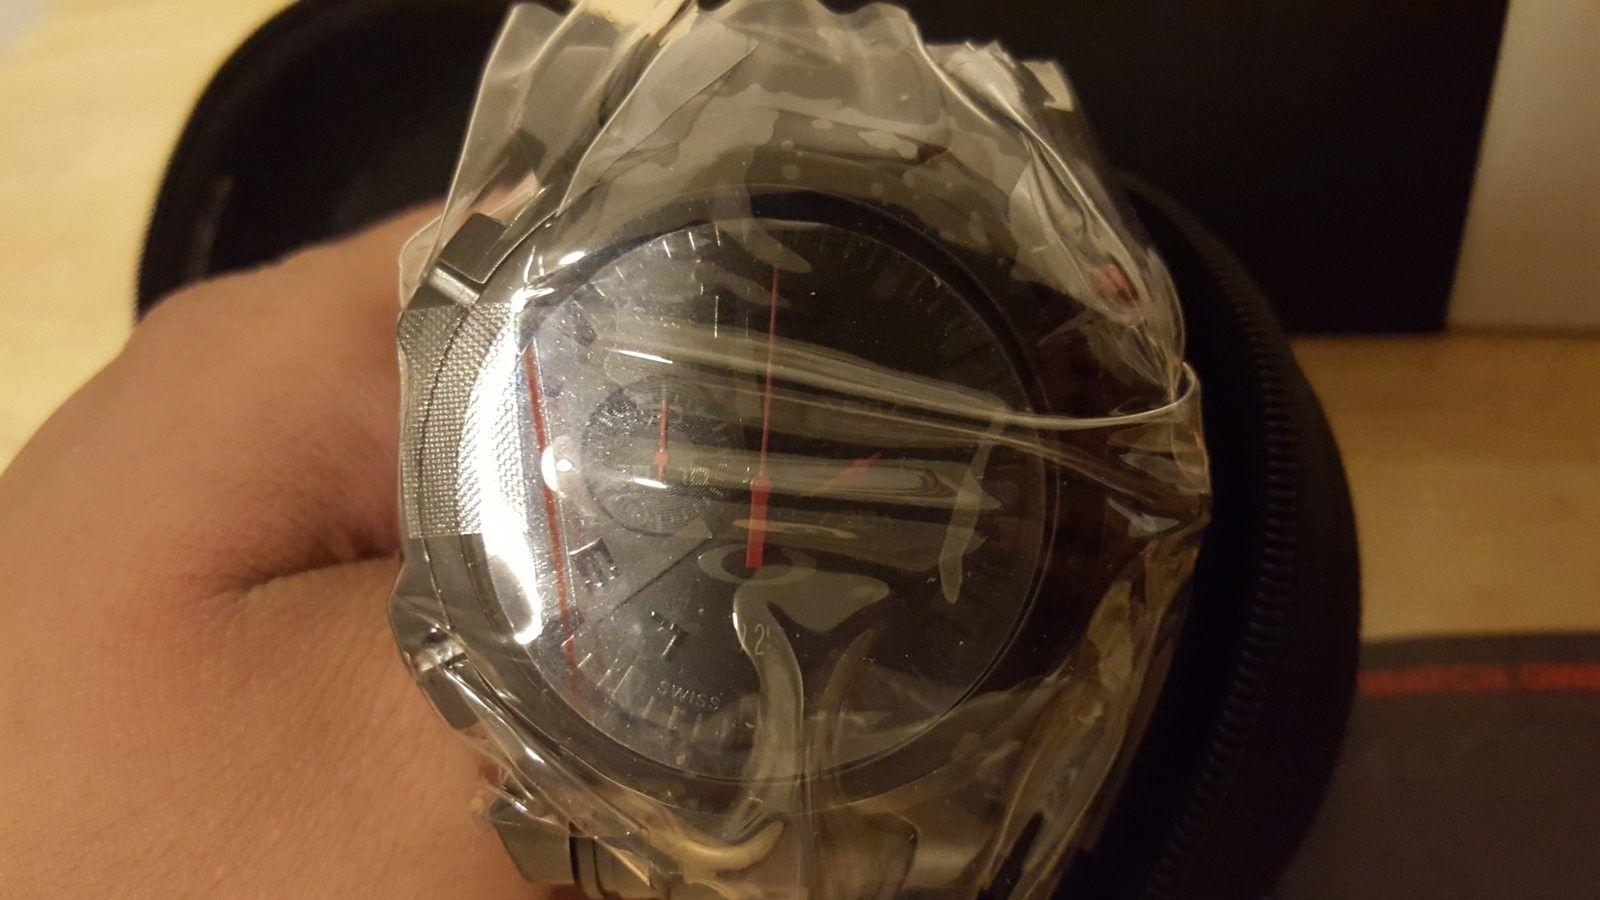 BNIB Stealth Double Tap Watch $450 Shipped - 20160330_003902.jpg